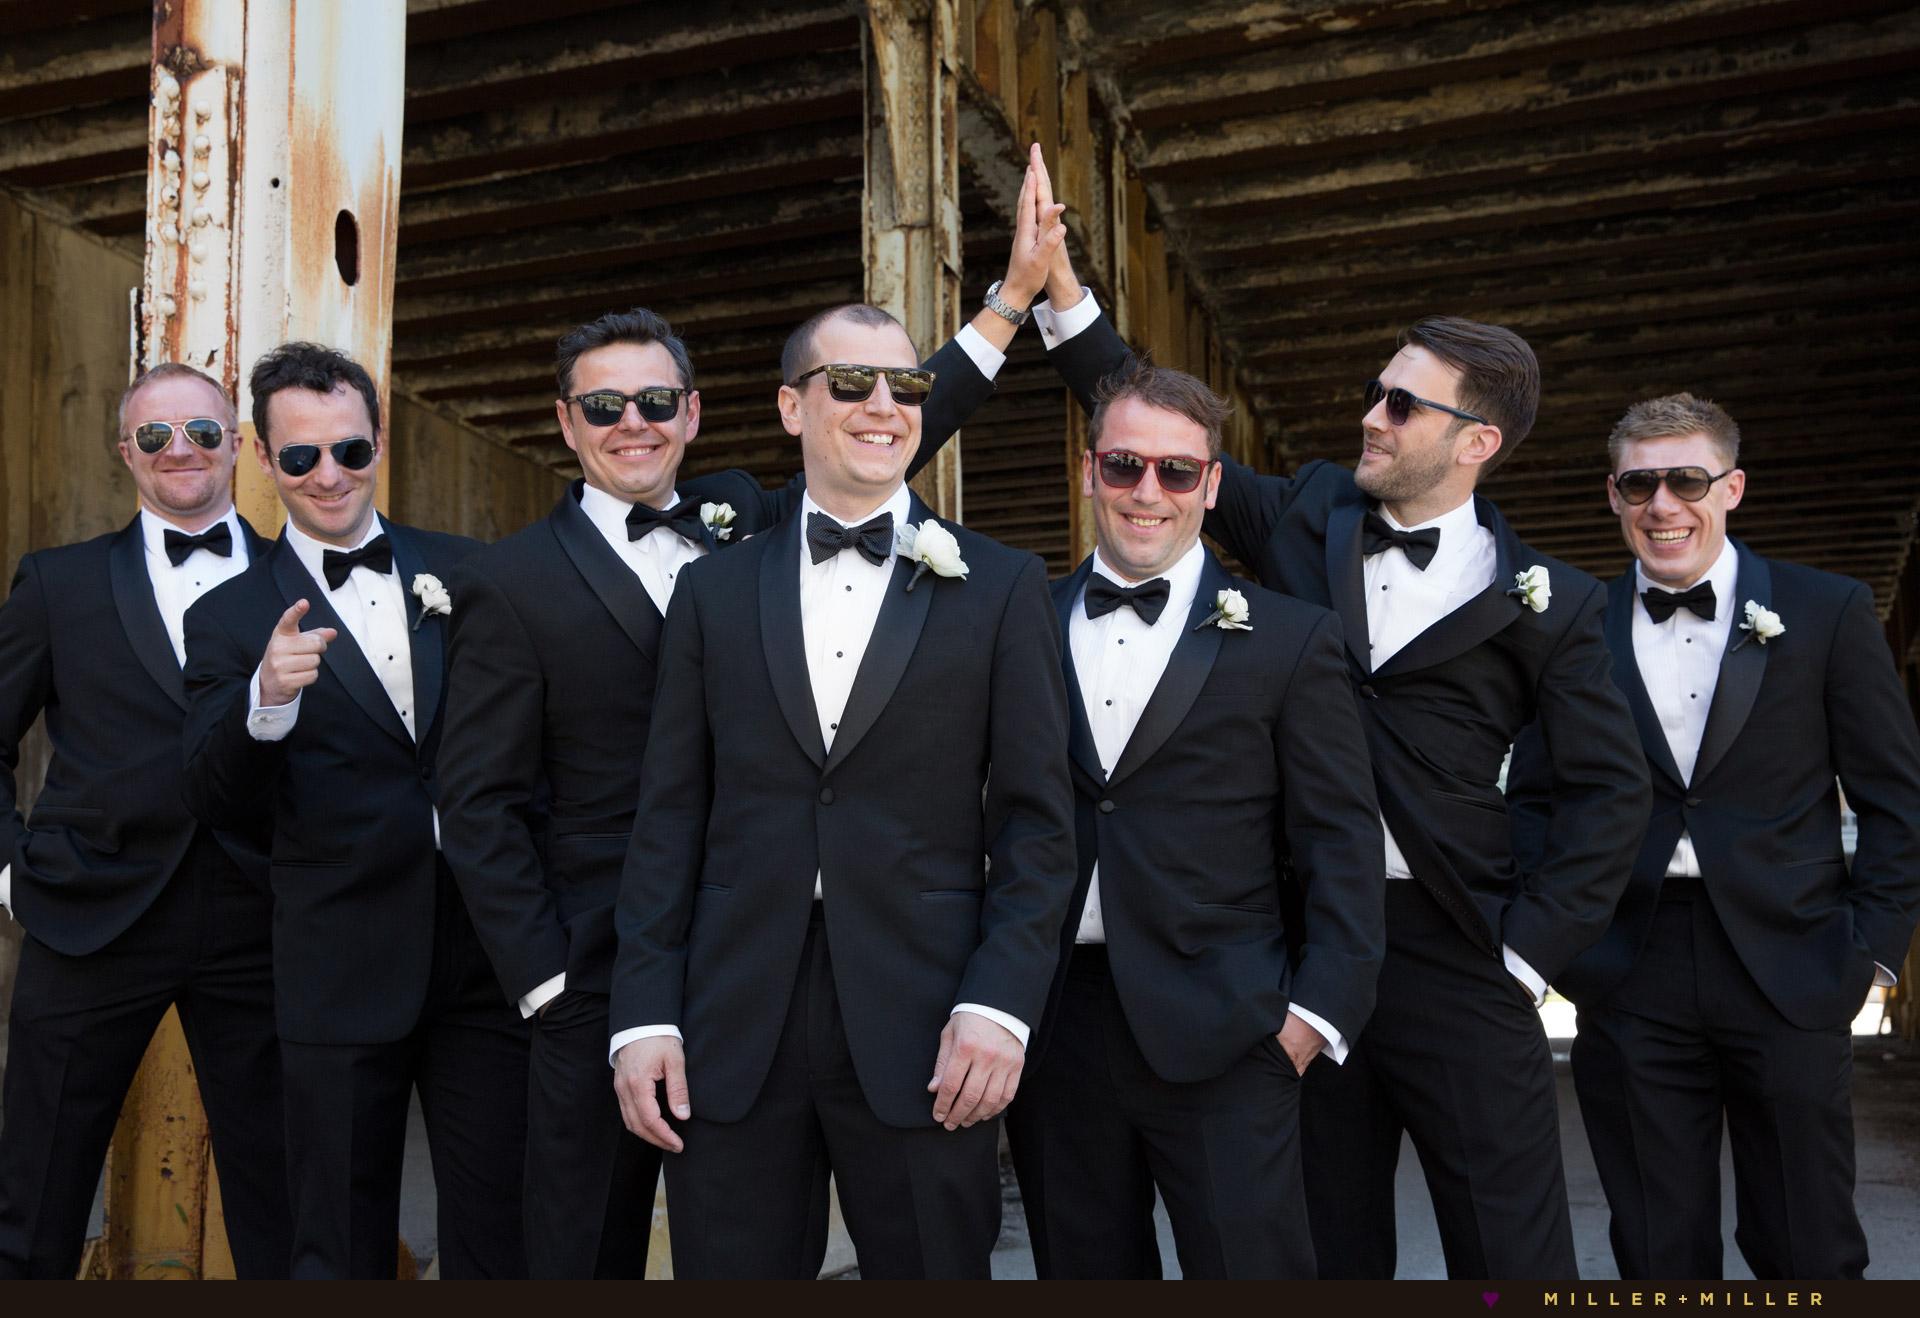 groom-groomsmen-sunglasses